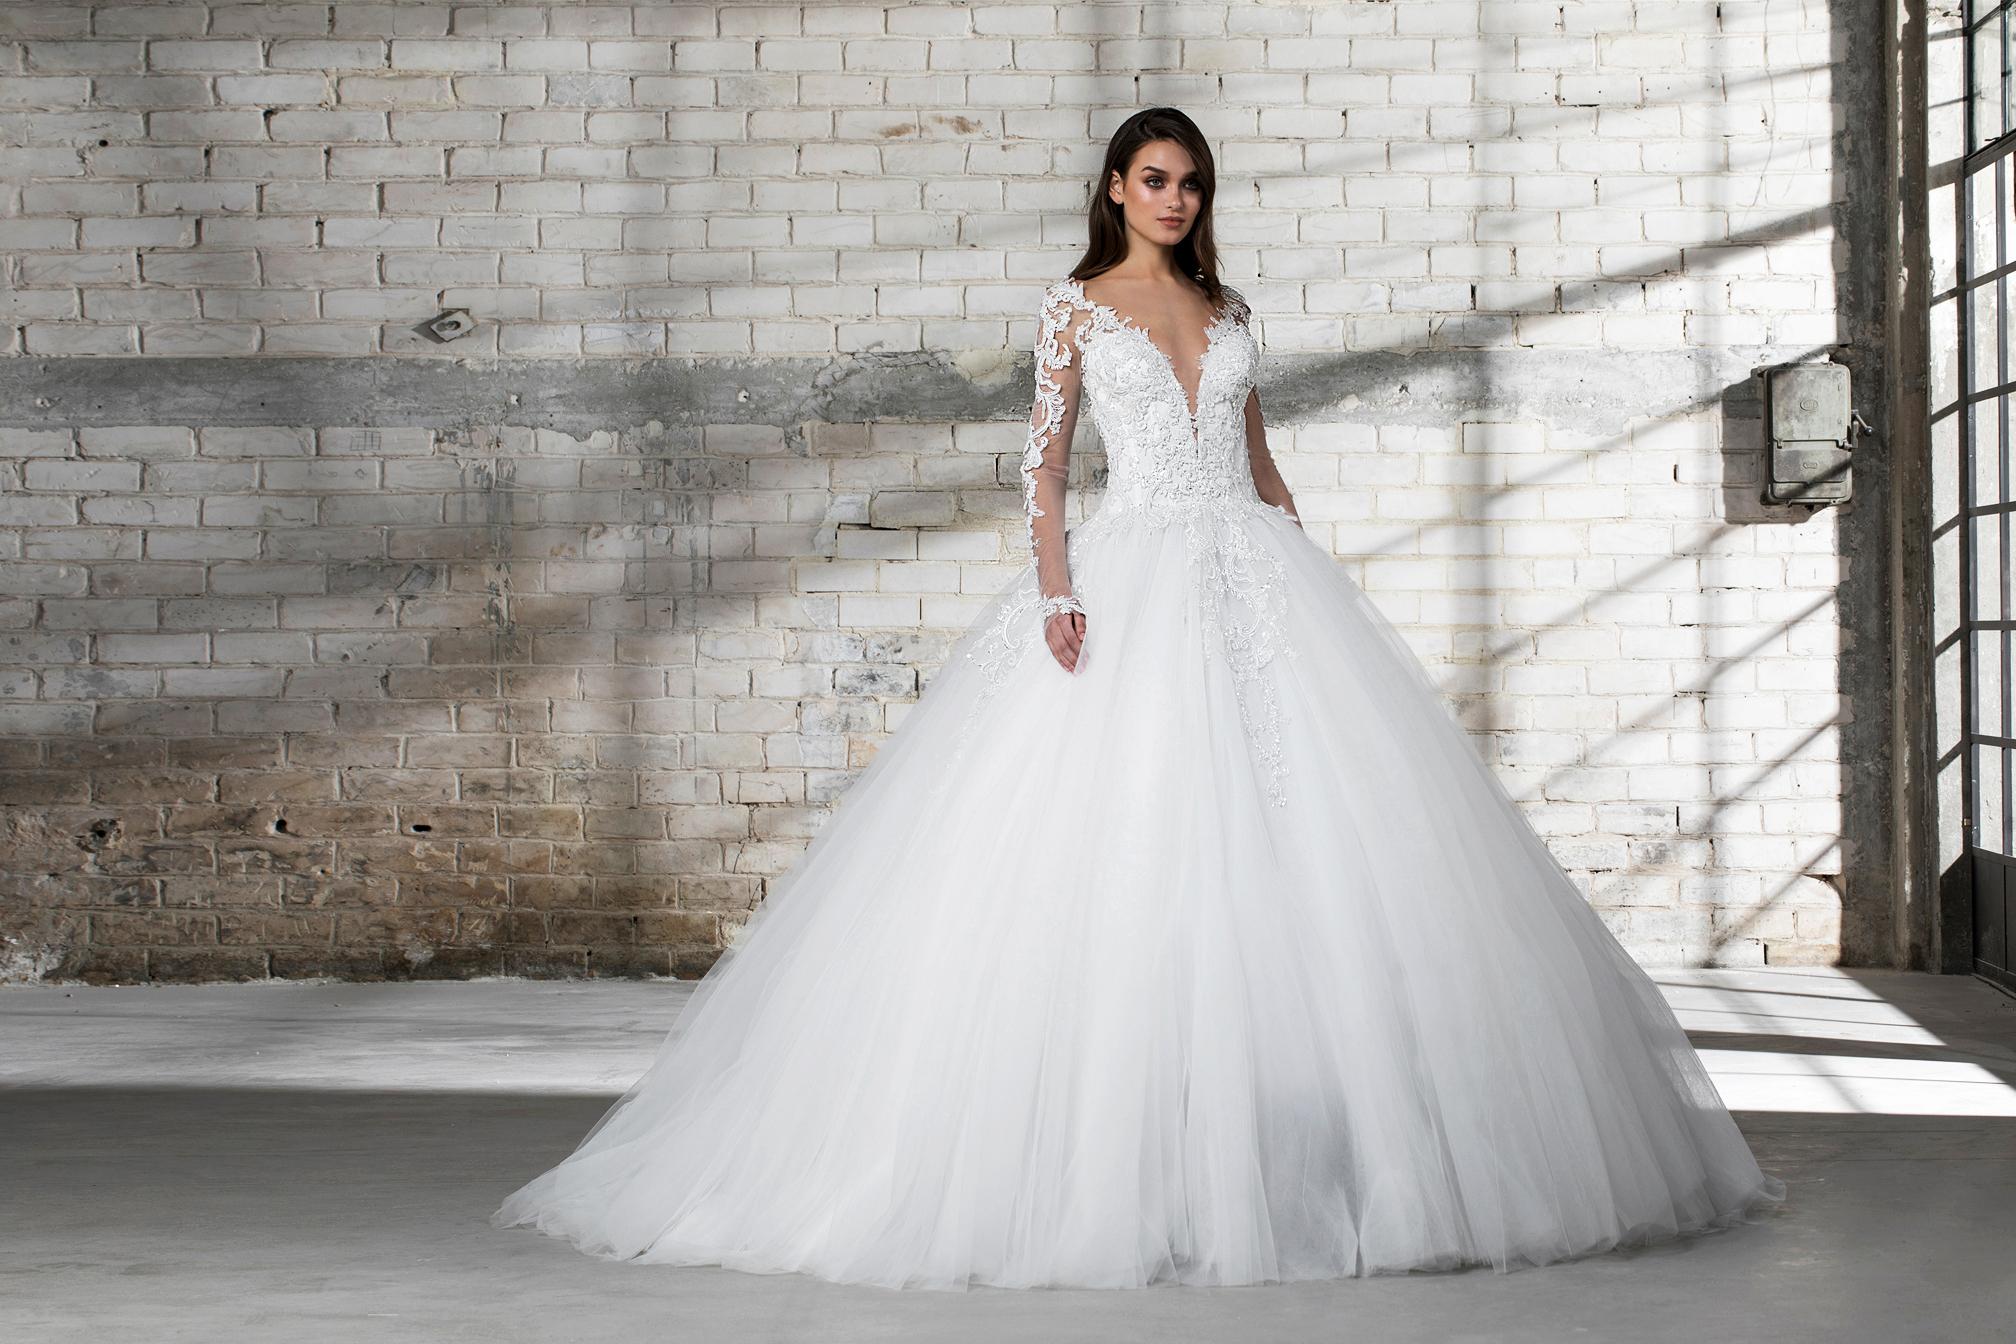 pnina tornai wedding dress spring 2019 ball gown long sleeves deep v